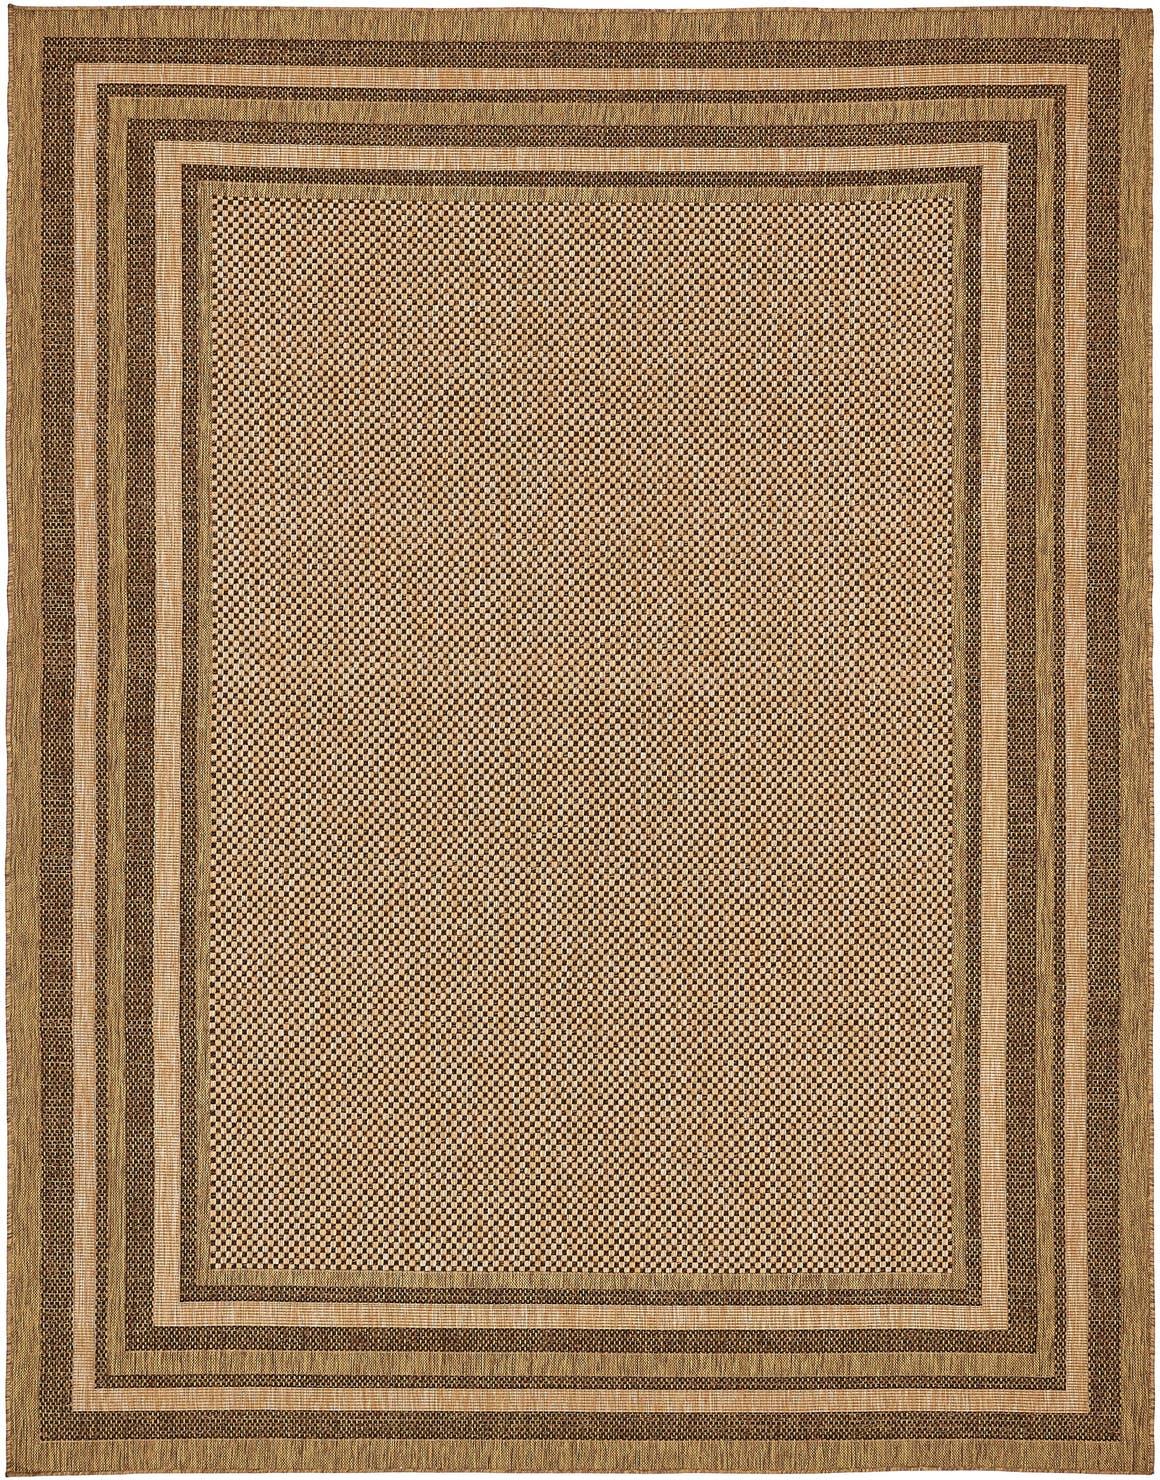 9' x 12' Outdoor Border Rug main image